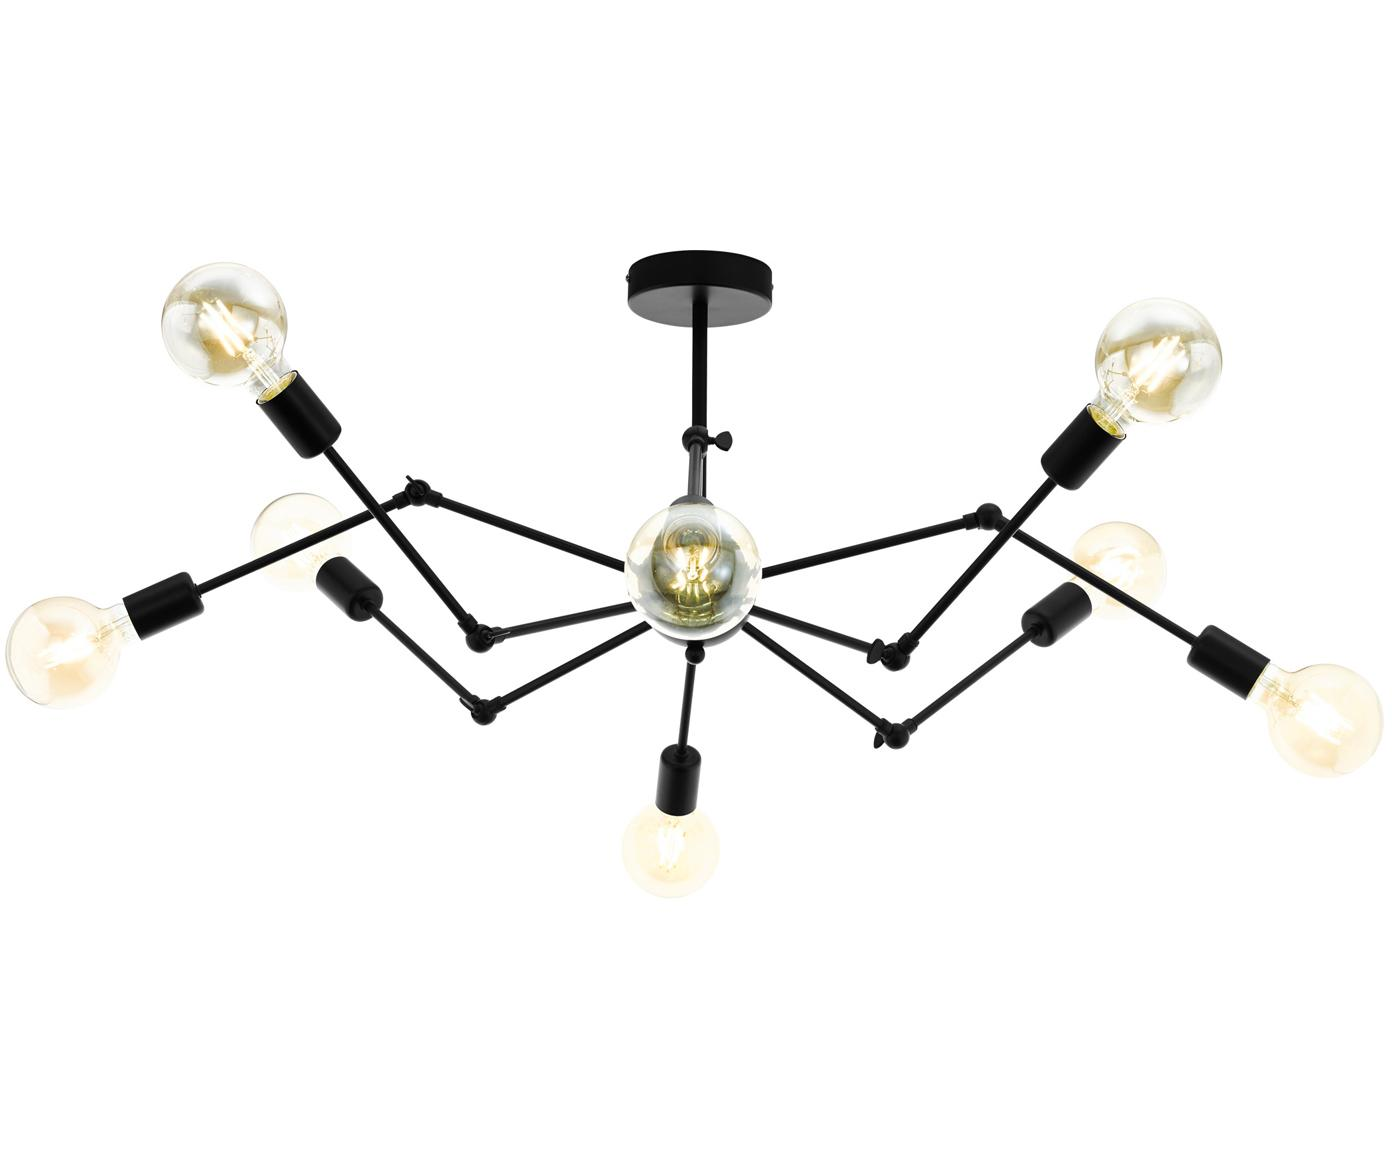 Design plafondlamp Exmoor, Zwart, Ø 96 x H 40 cm